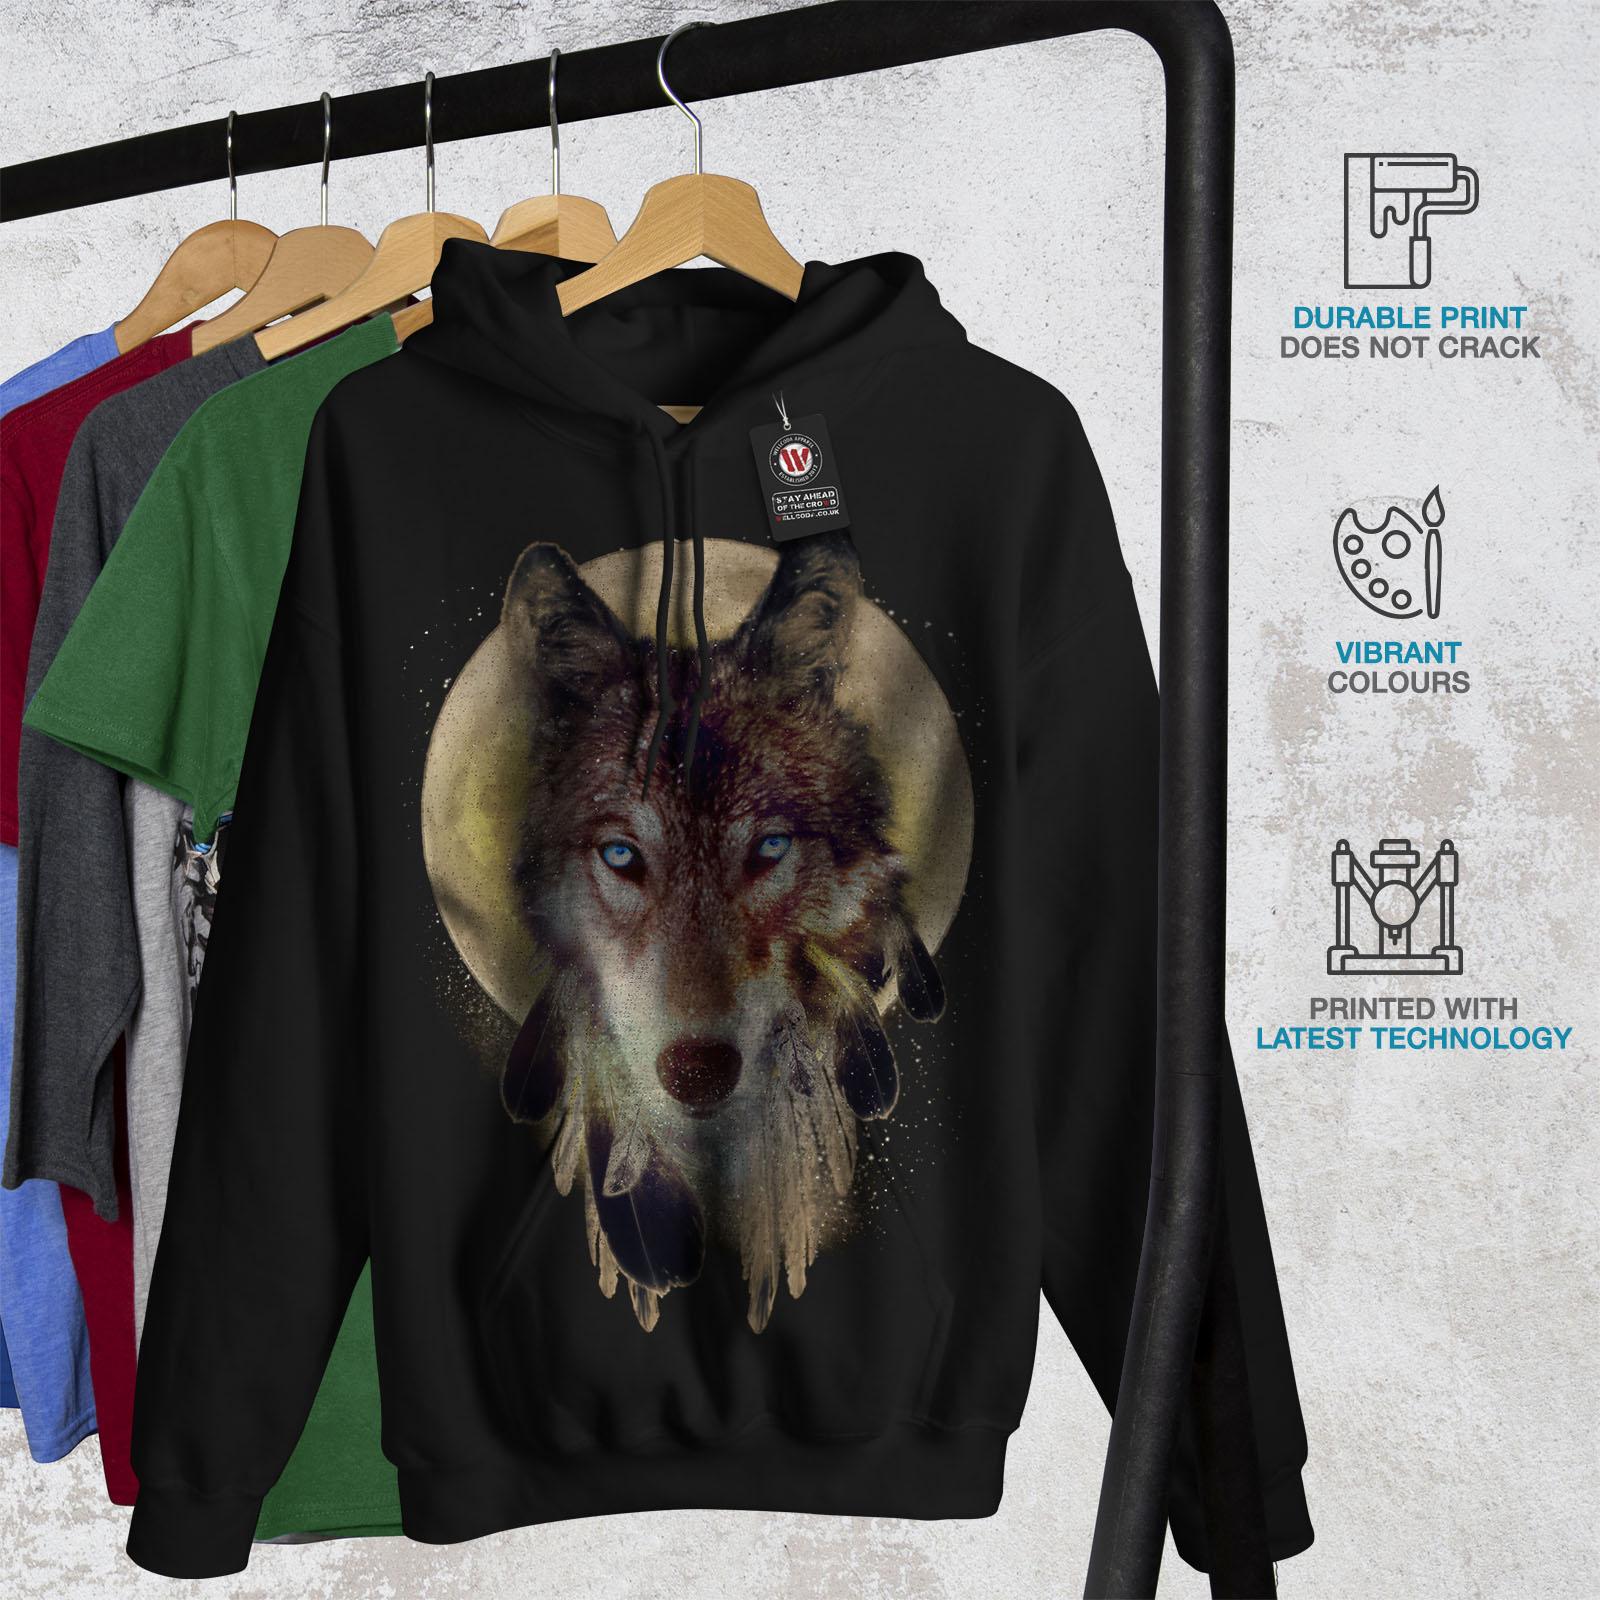 Wellcoda-Wolf-Dream-Catcher-Womens-Hoodie-Wild-Casual-Hooded-Sweatshirt thumbnail 4